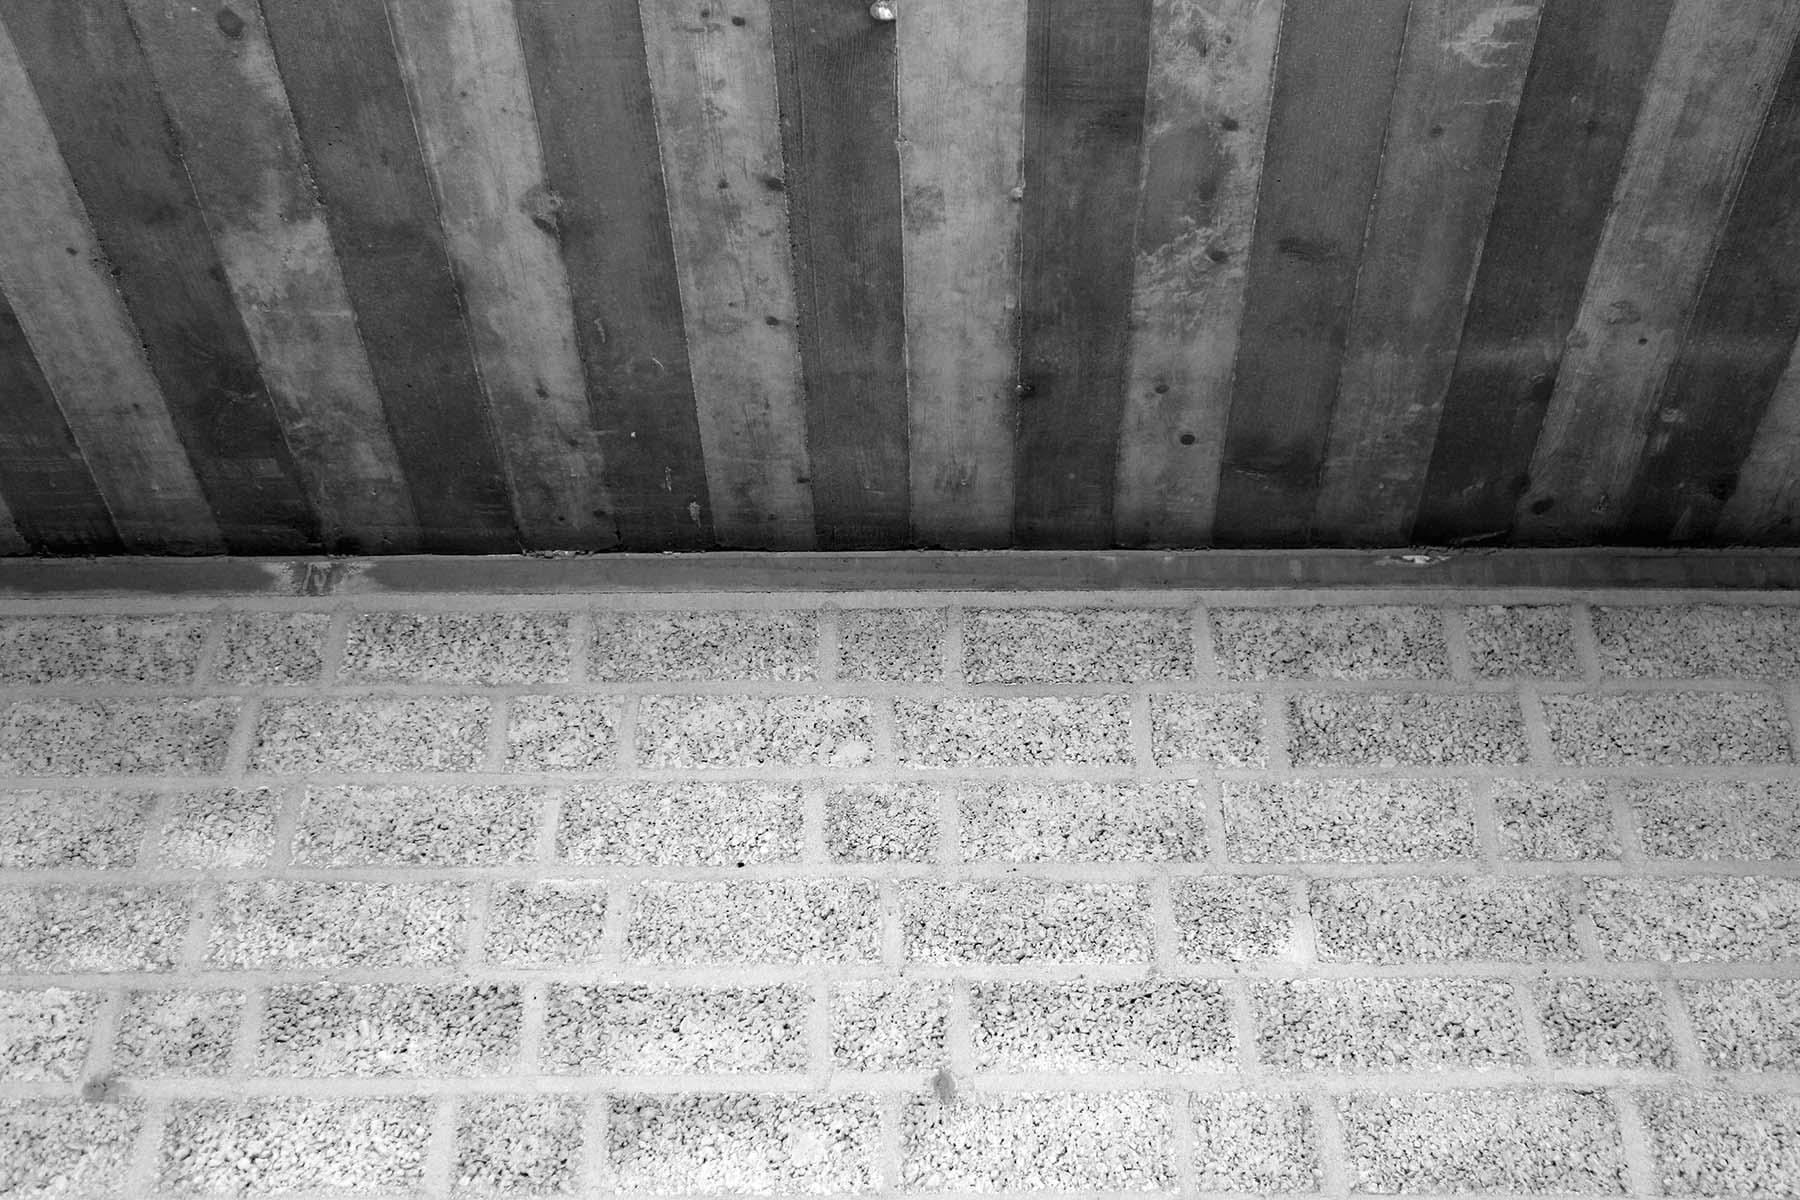 Schmela Haus. Dutch structuralist Aldo van Eyck designed the visionary building, made of pumice concrete ...